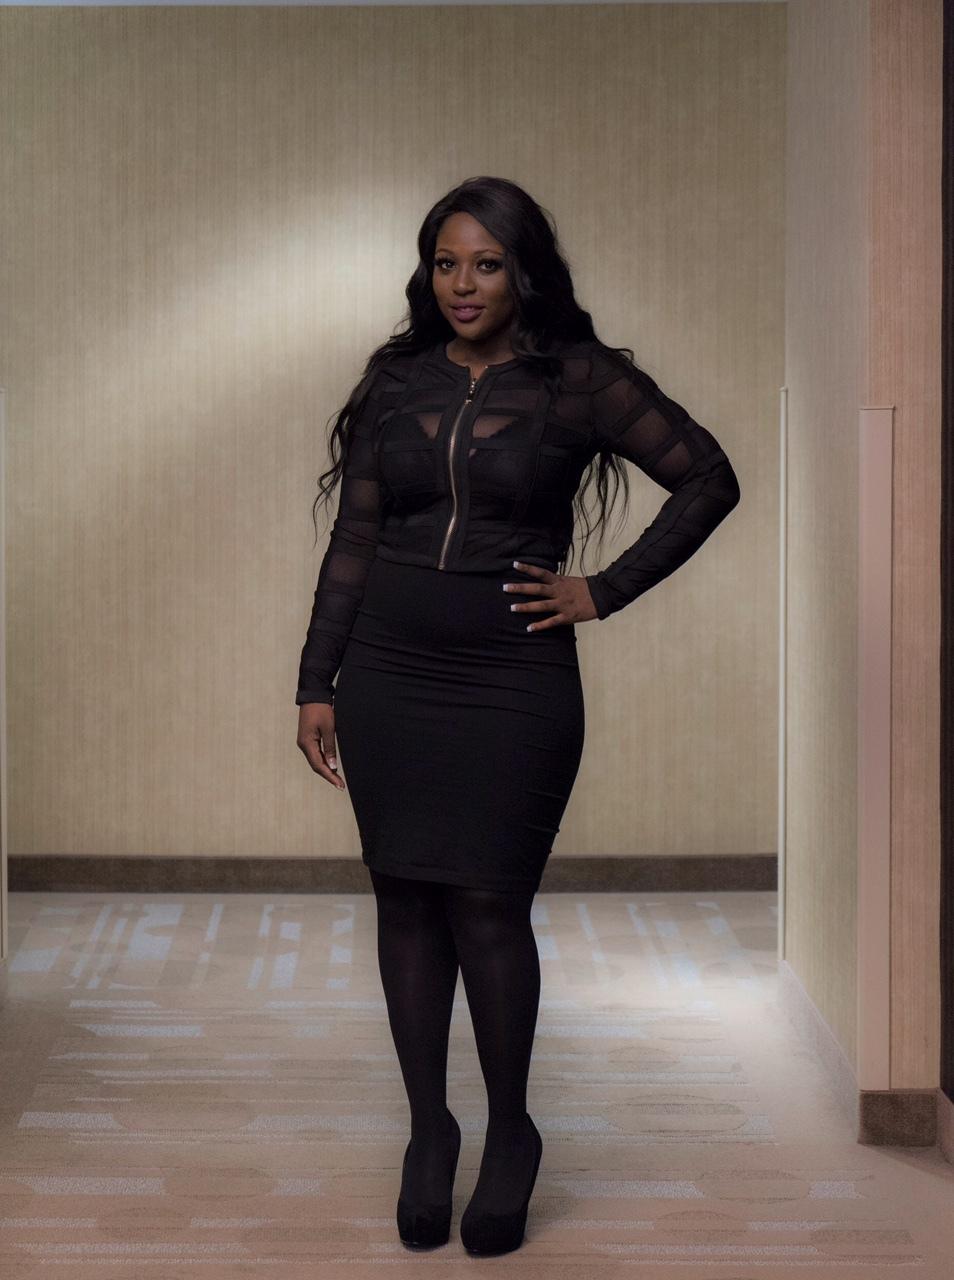 Blacked new york escort tiffany brookes gets facial from big - 1 4